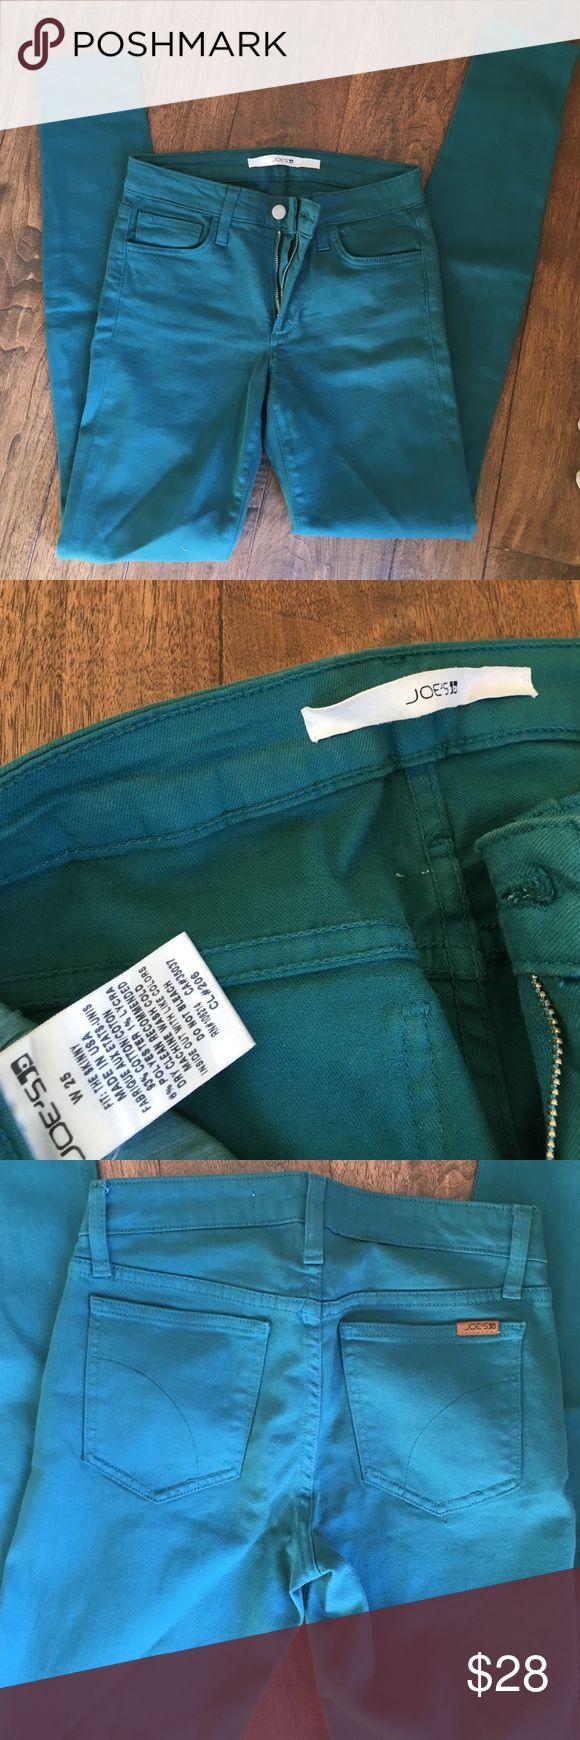 Joe's Skinny Jeans Teal, skinny jeans. Joe's Jeans Jeans Skinny